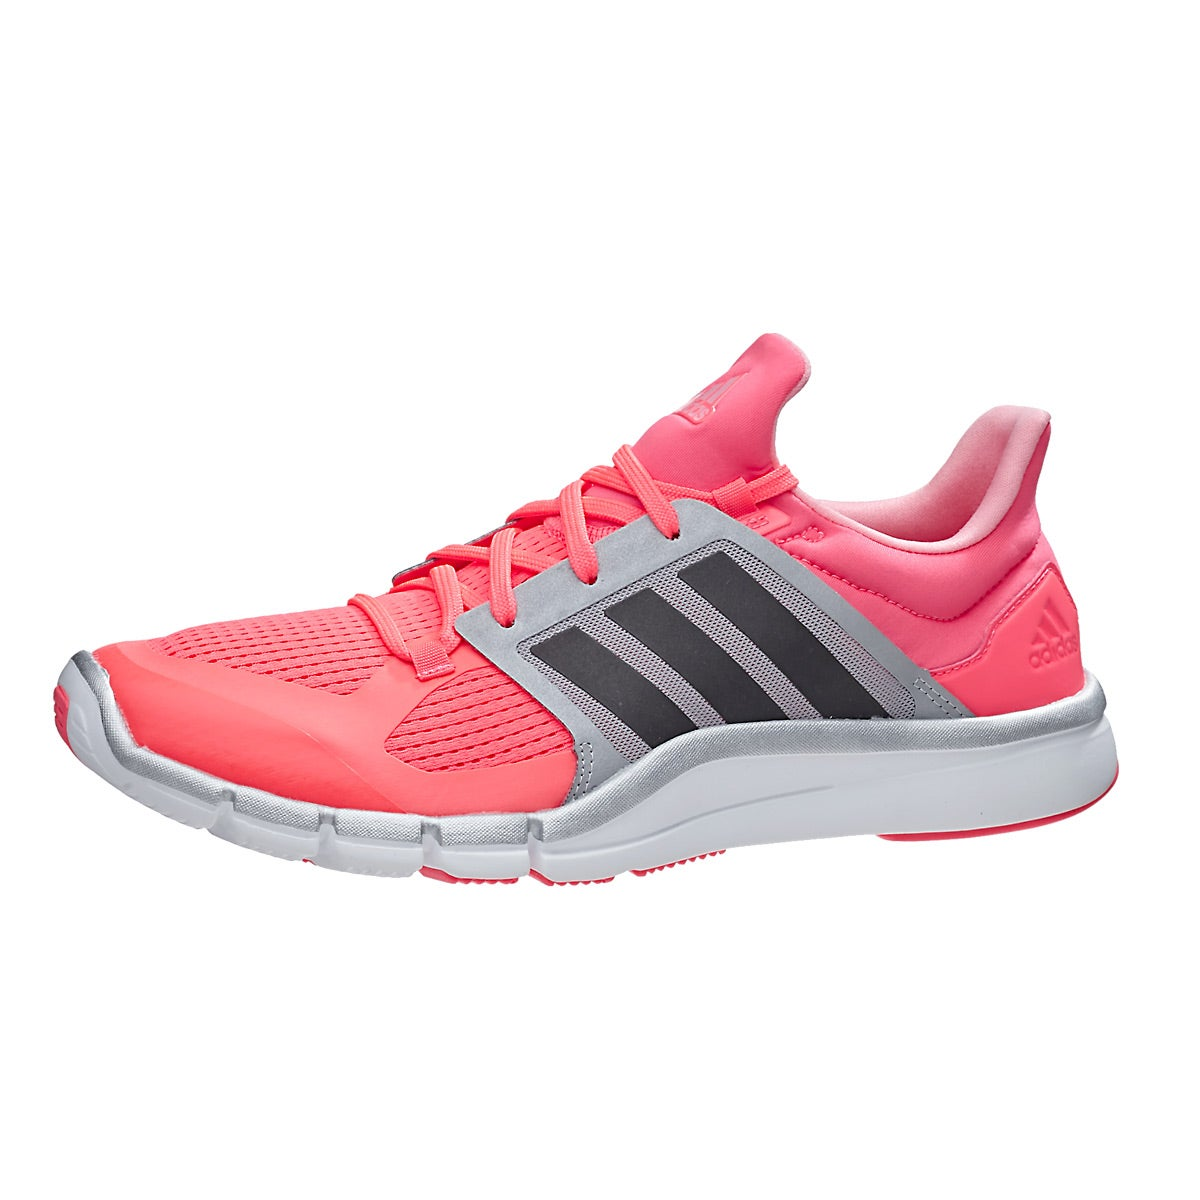 adidas adipure 360.3 trainer women's training shoes